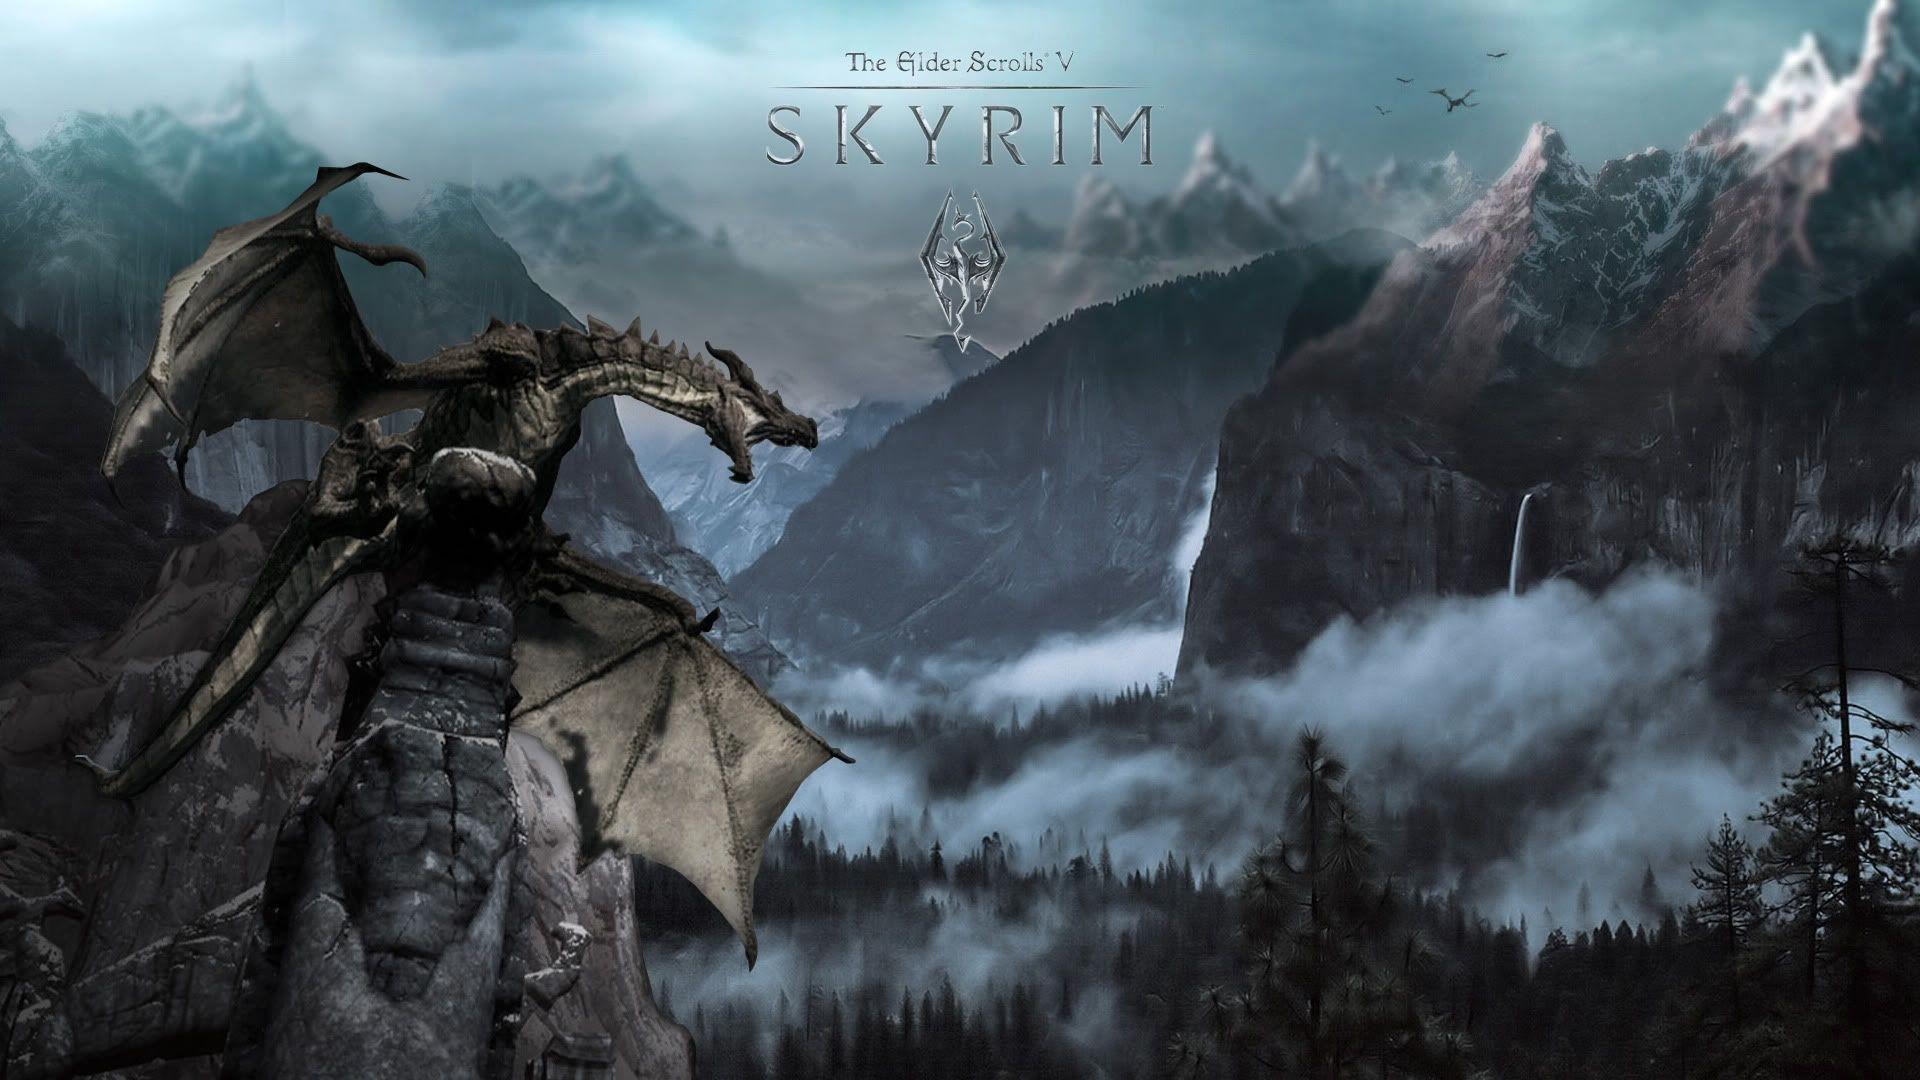 Skyrim Backgrounds – Wallpaper Cave